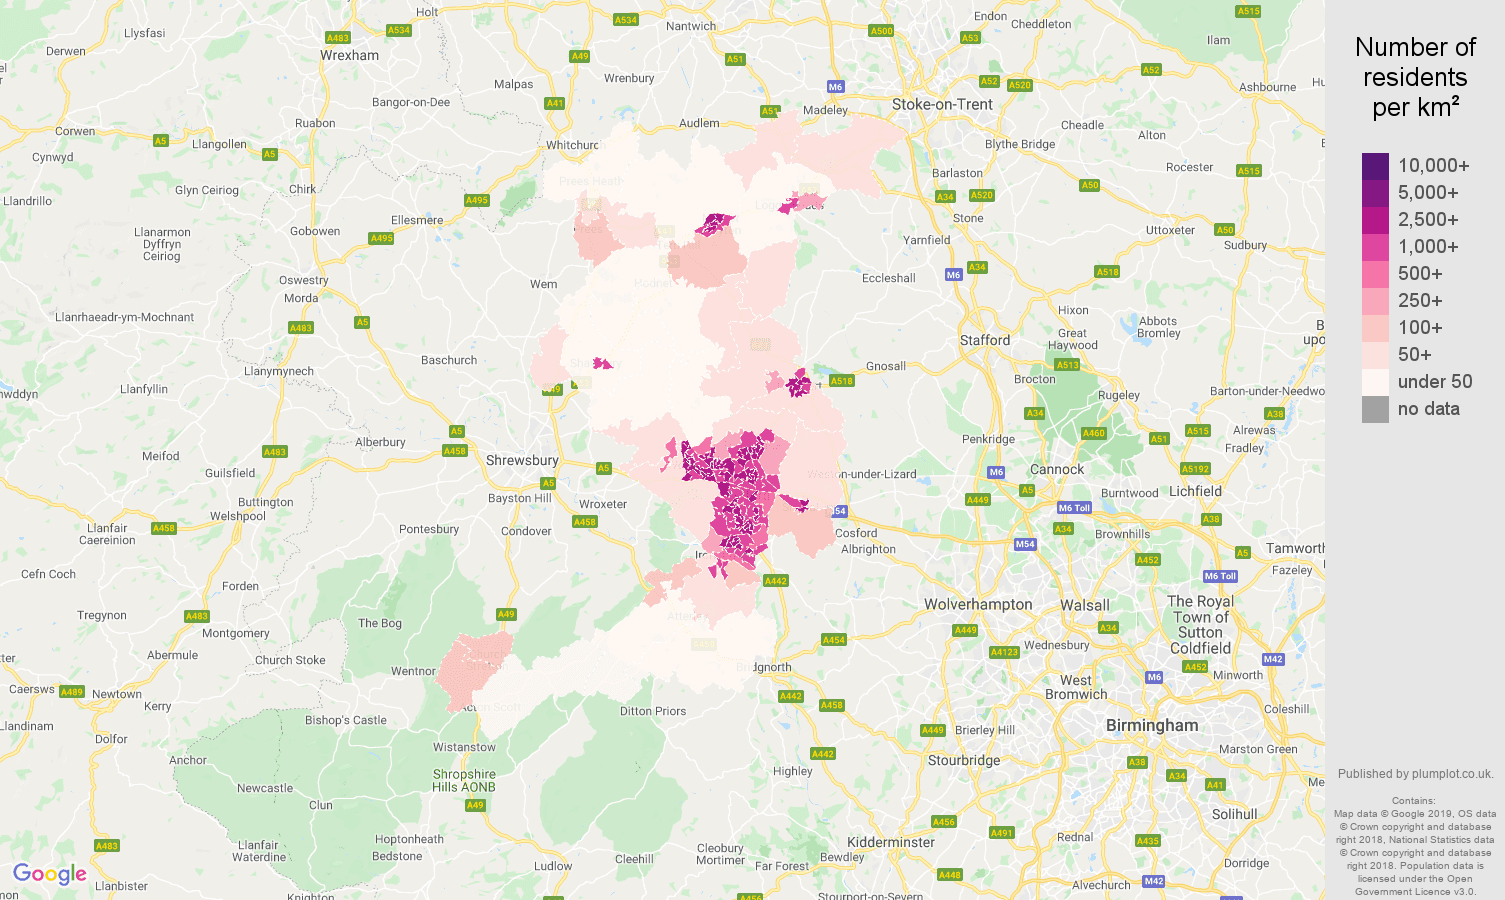 Telford population density map